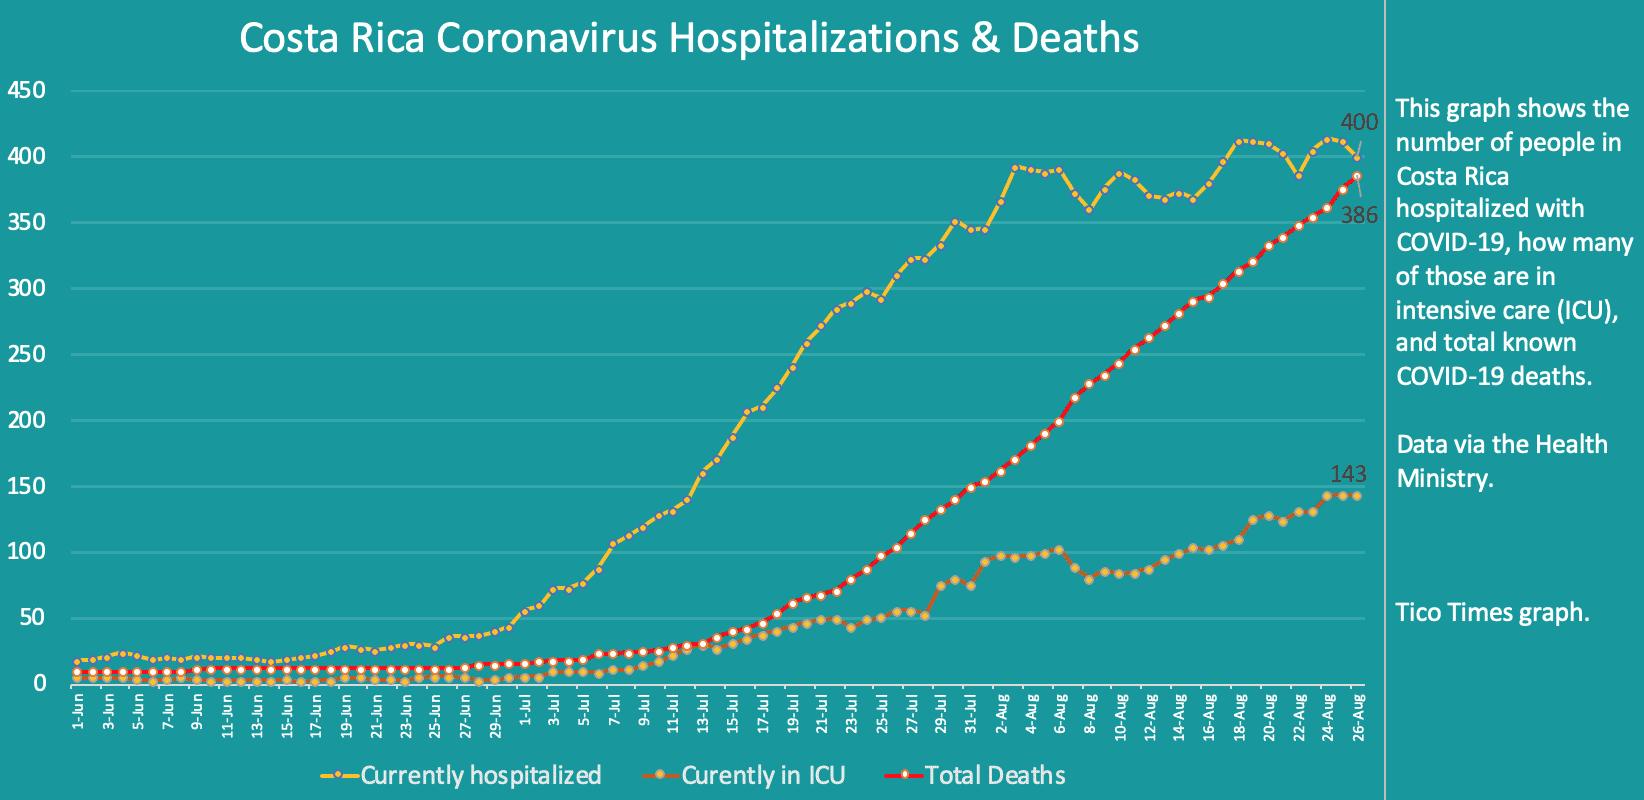 Costa Rica coronavirus hospitalizations and deaths on August 26, 2020